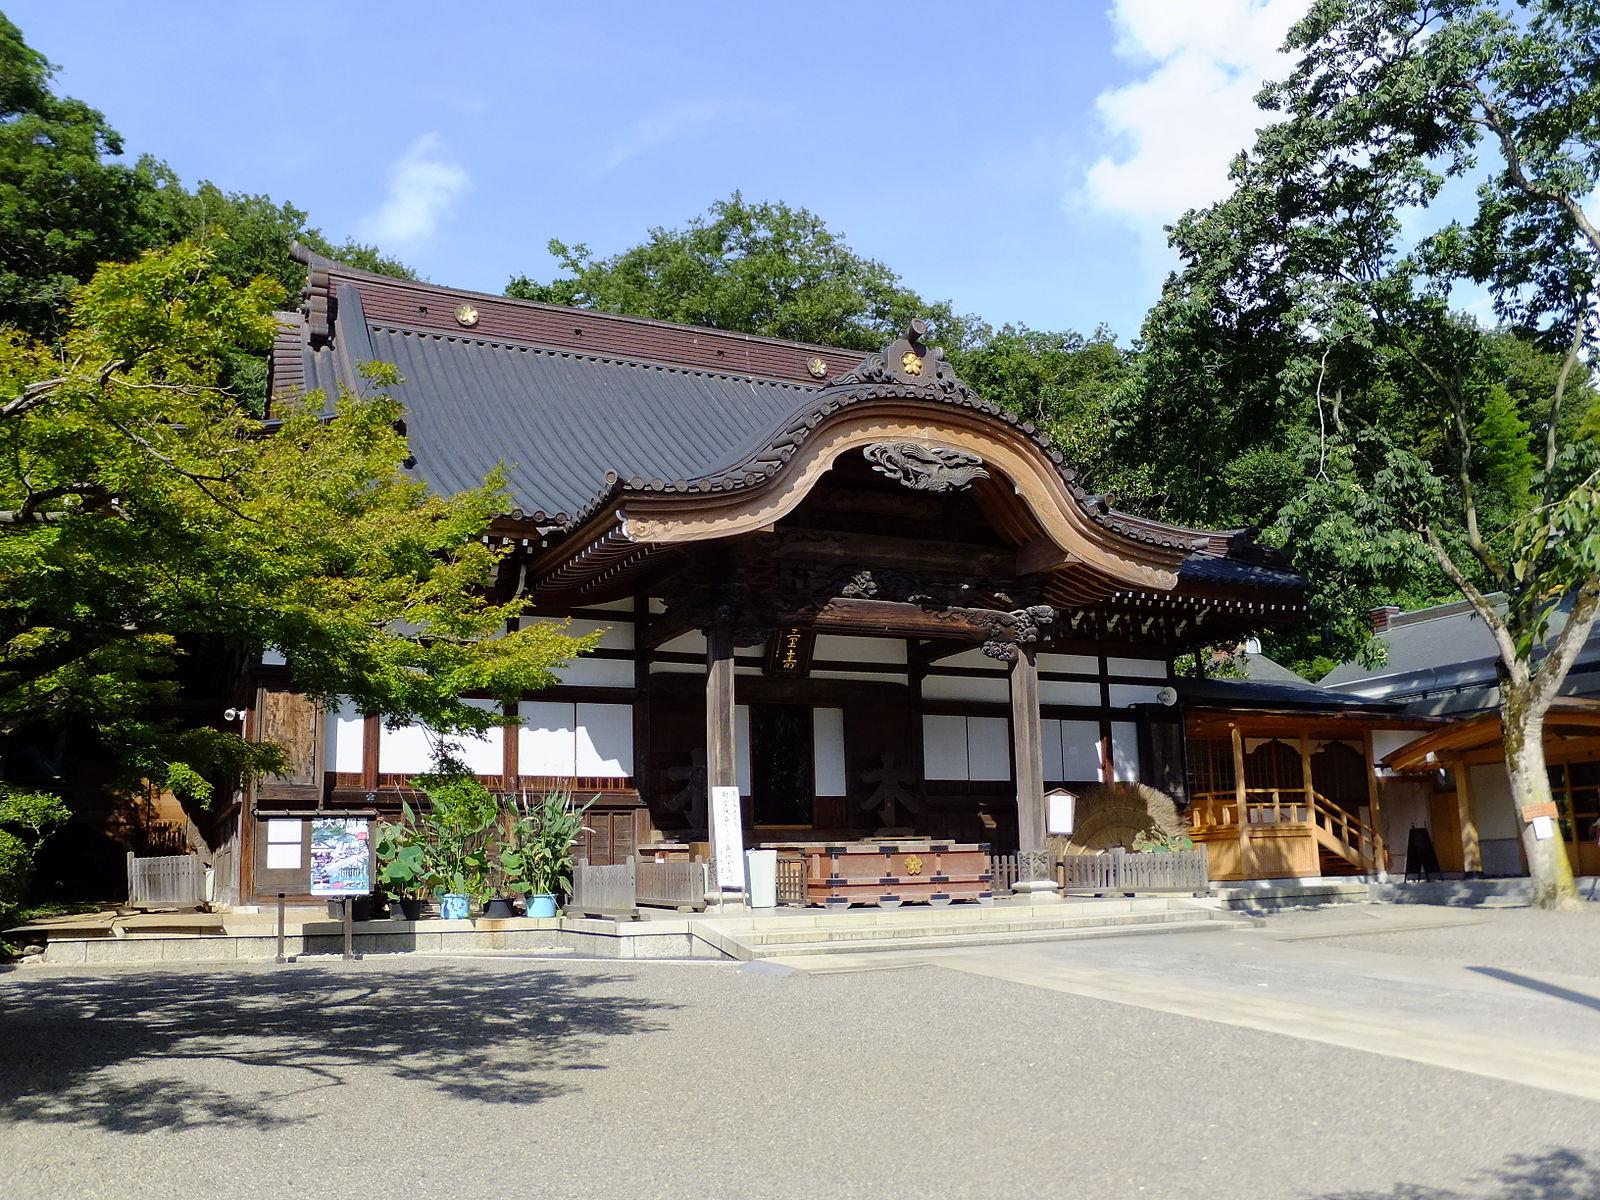 Jindai ji in Chofu Tokyo Mitaka Travel Guide: A Quick Trip From Tokyo